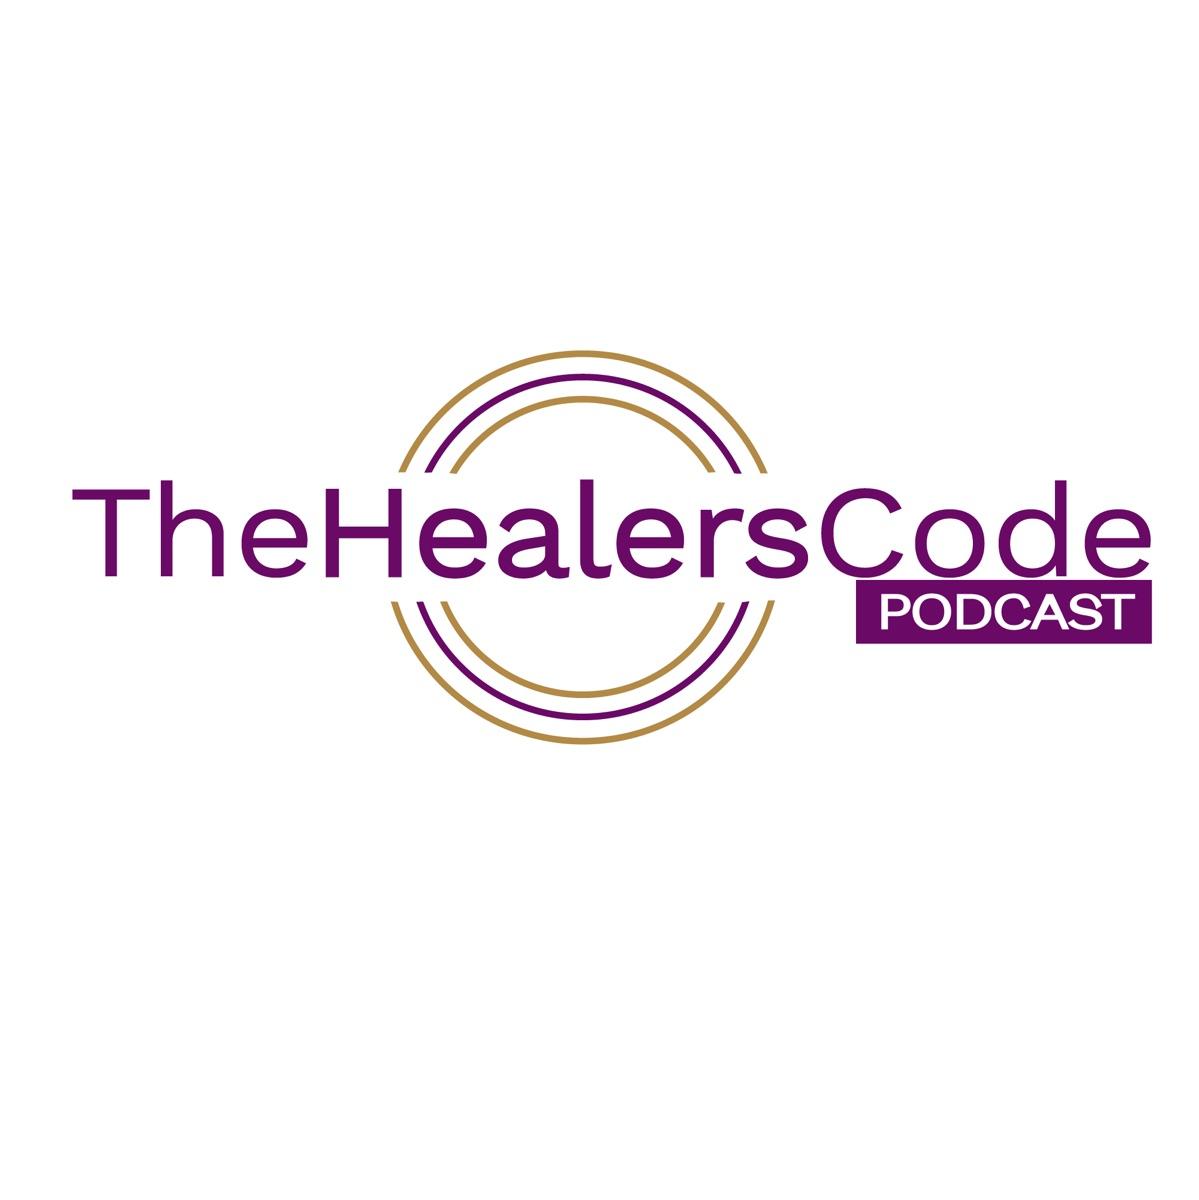 The Healer's Code Podcast